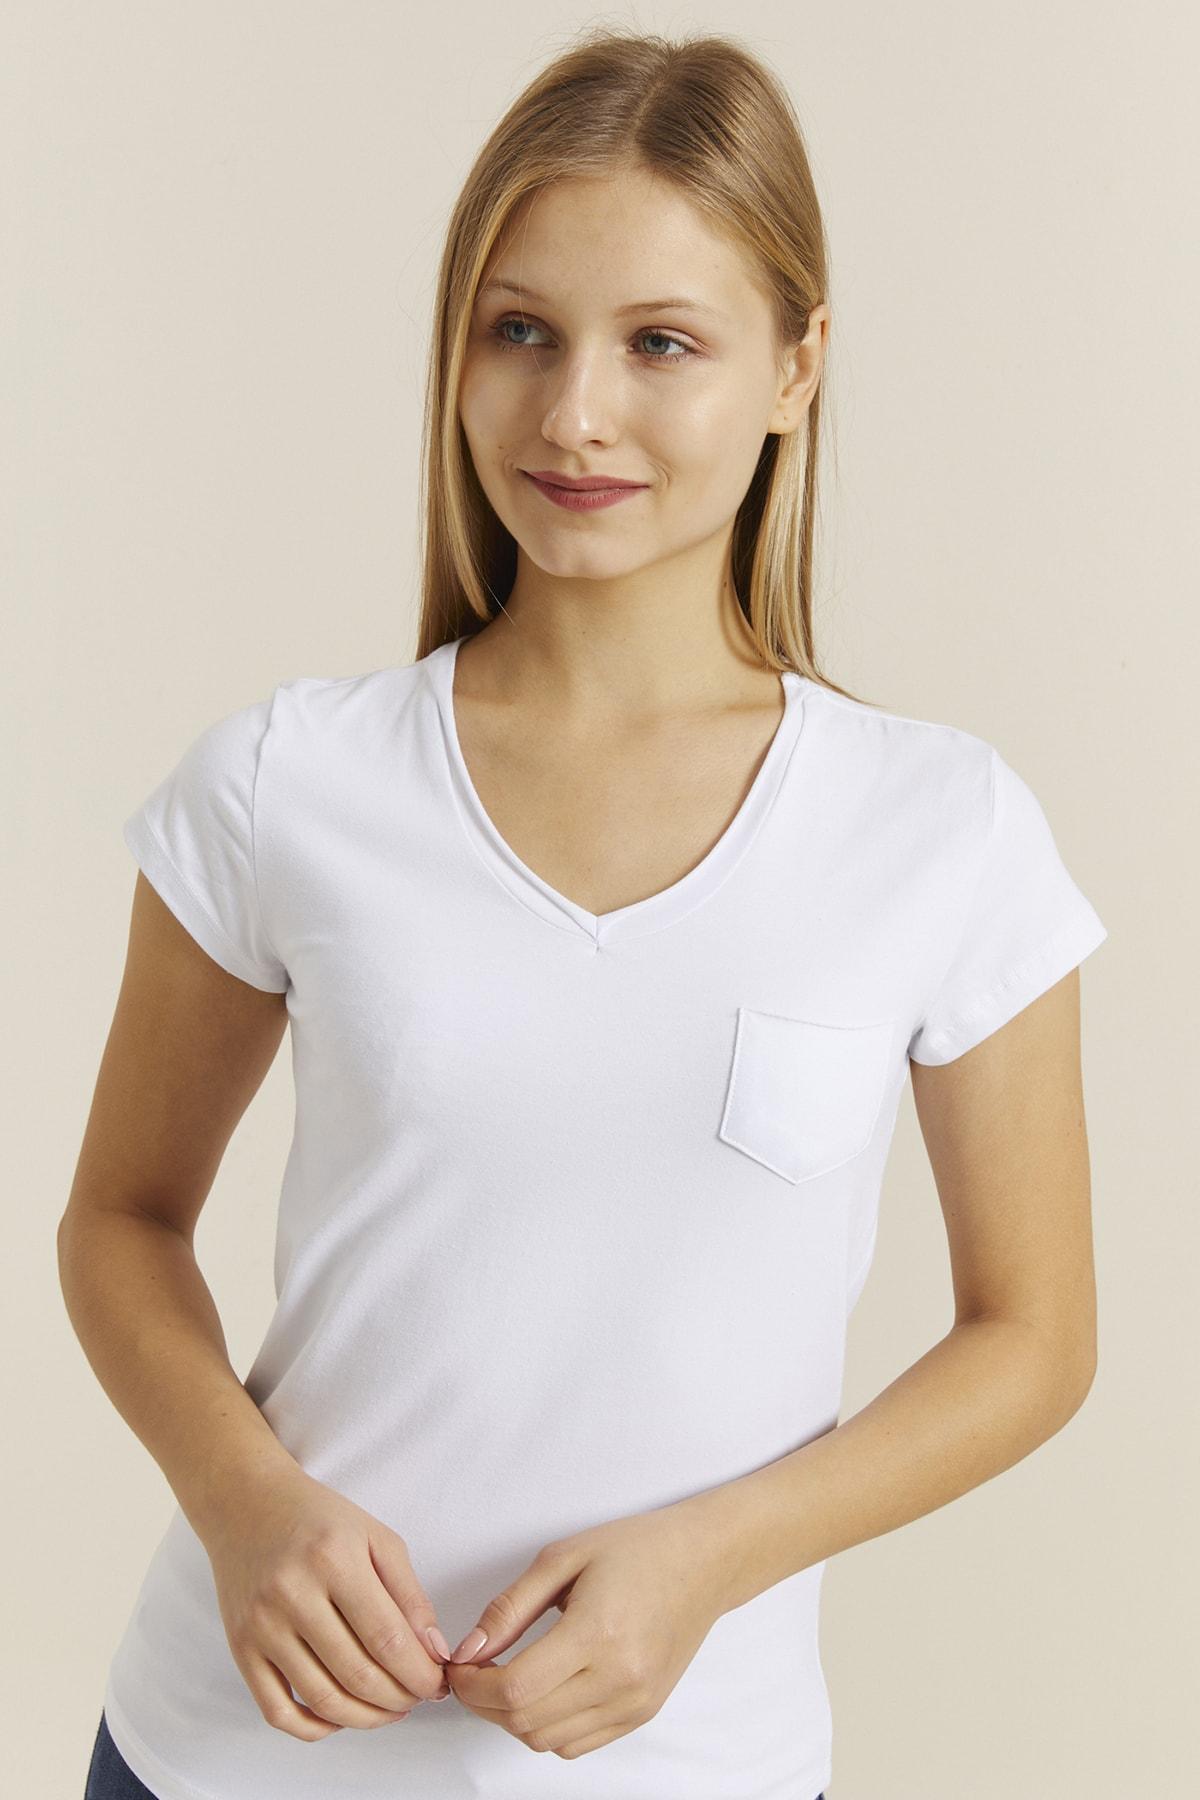 DYNAMO Kadın Beyaz V Yaka Cepli T-shirt 19052 2